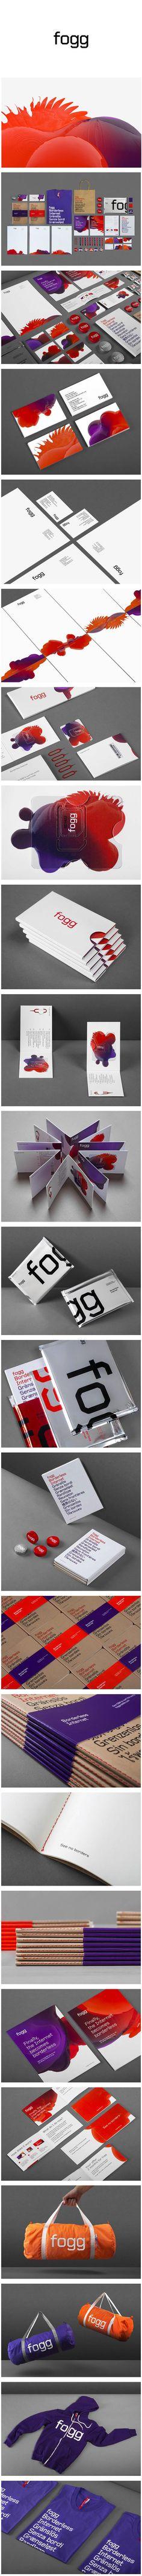 Fogg #identity #packaging #branding #marketing PD